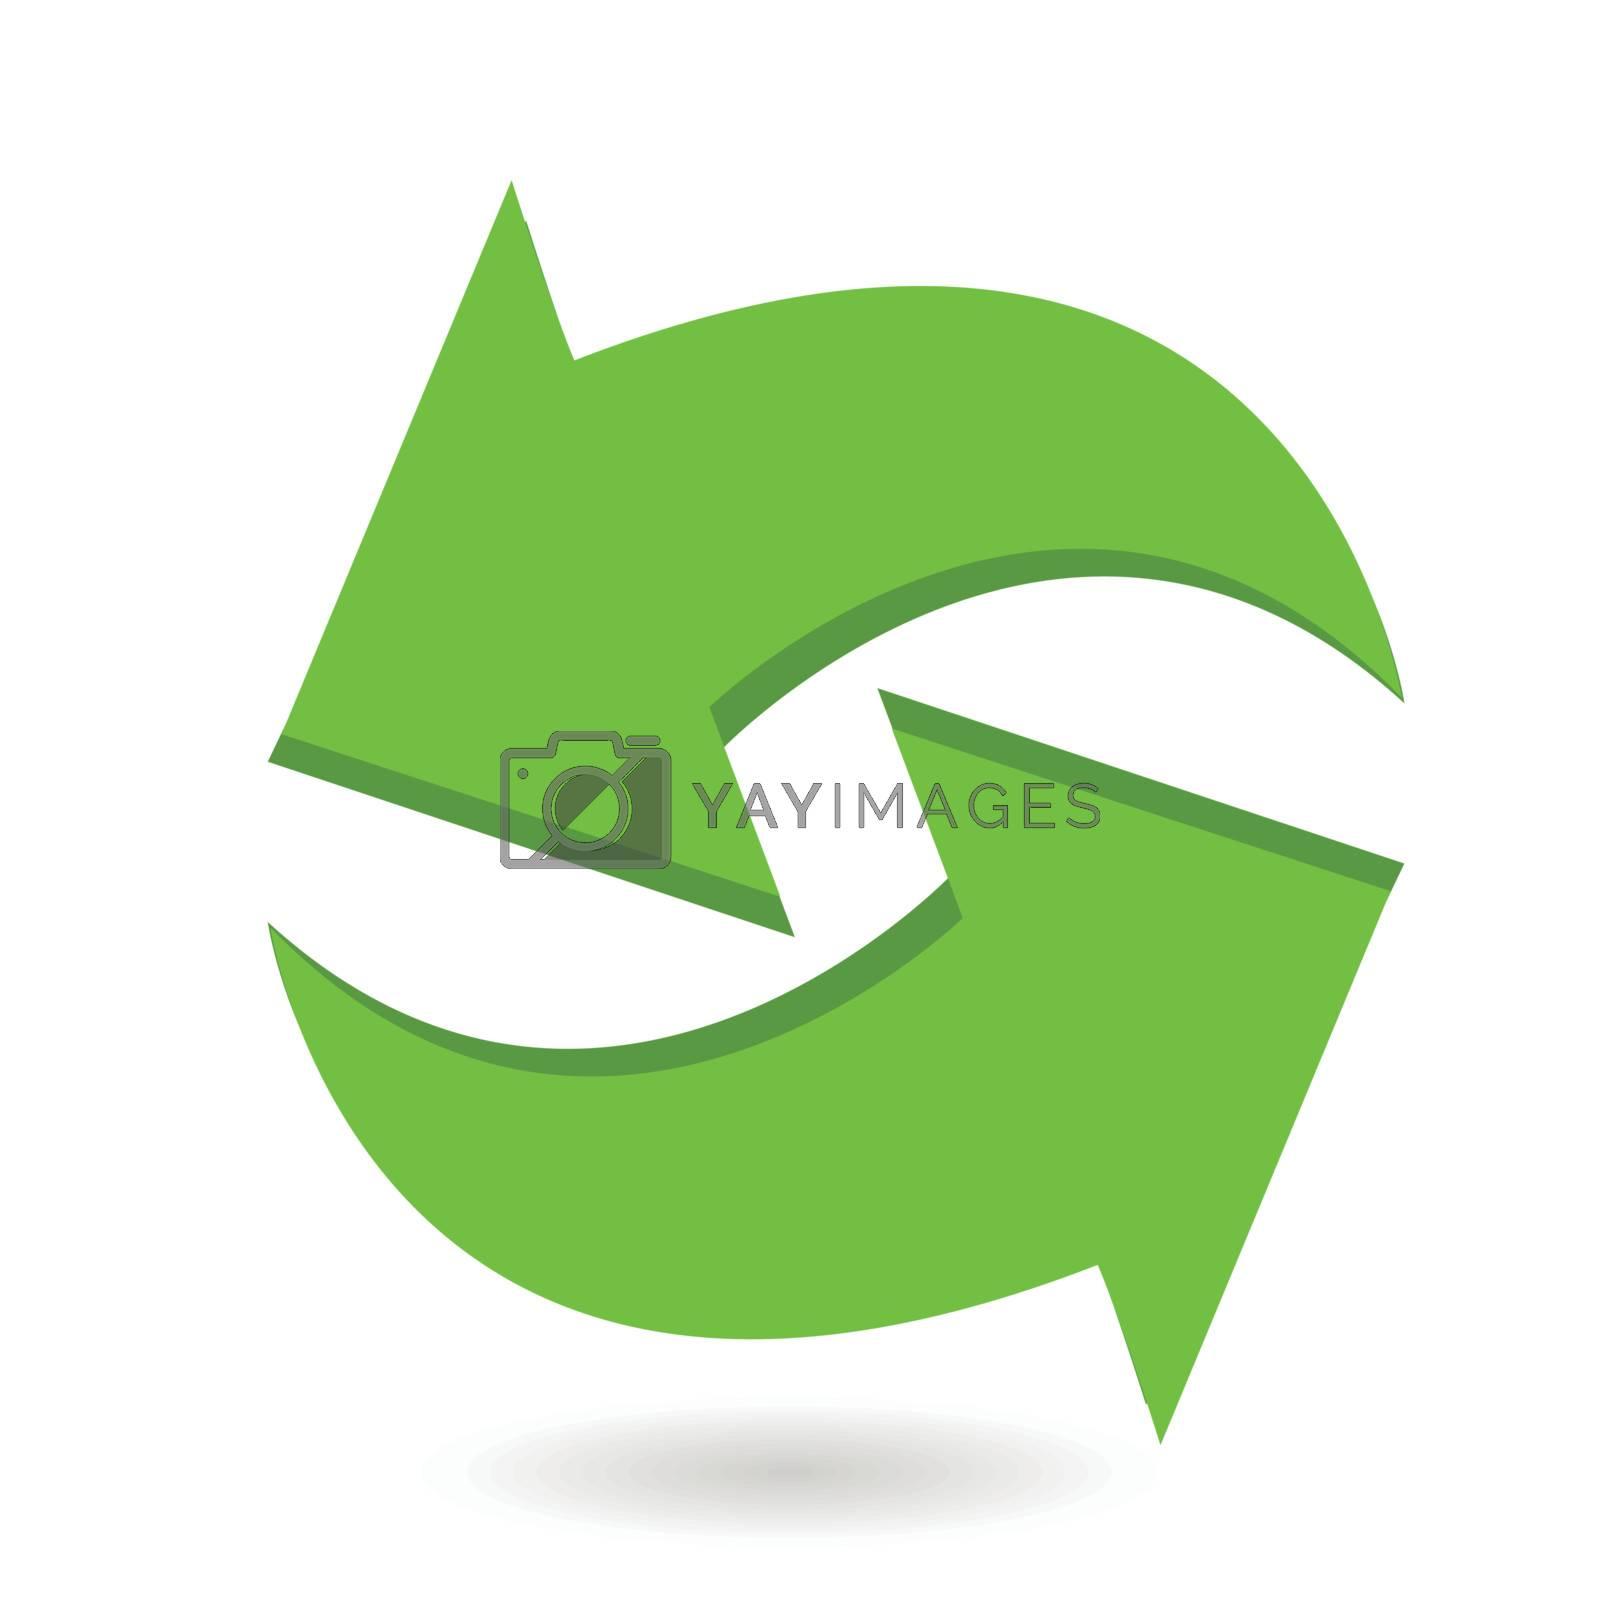 Illustration, symbolic circular green arrows on white background